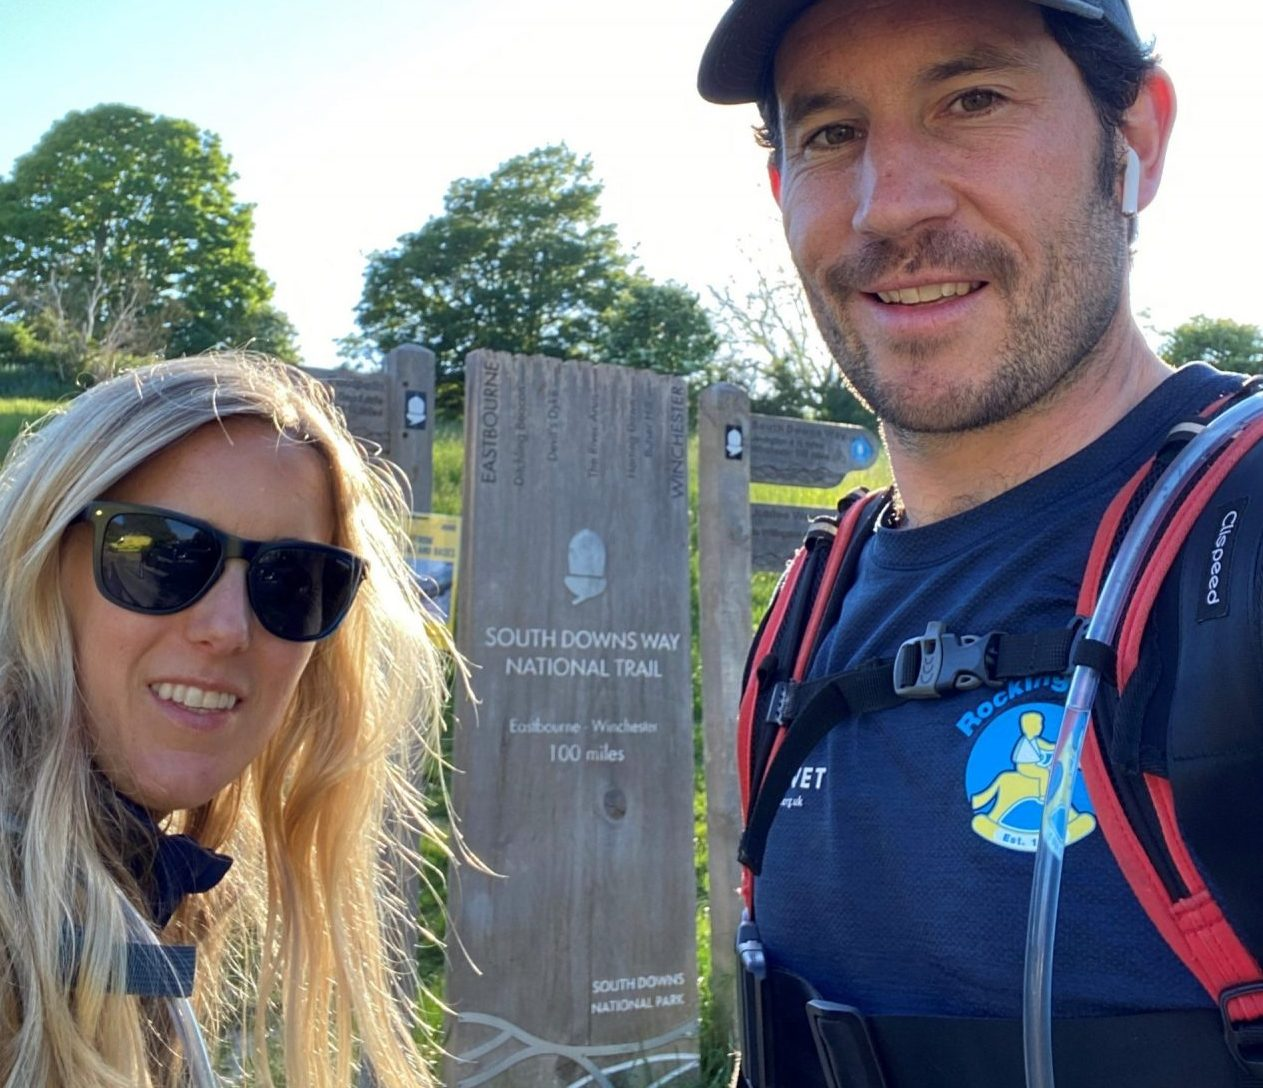 Josh's South Downs Way challenge raises £1,700 for children's charity